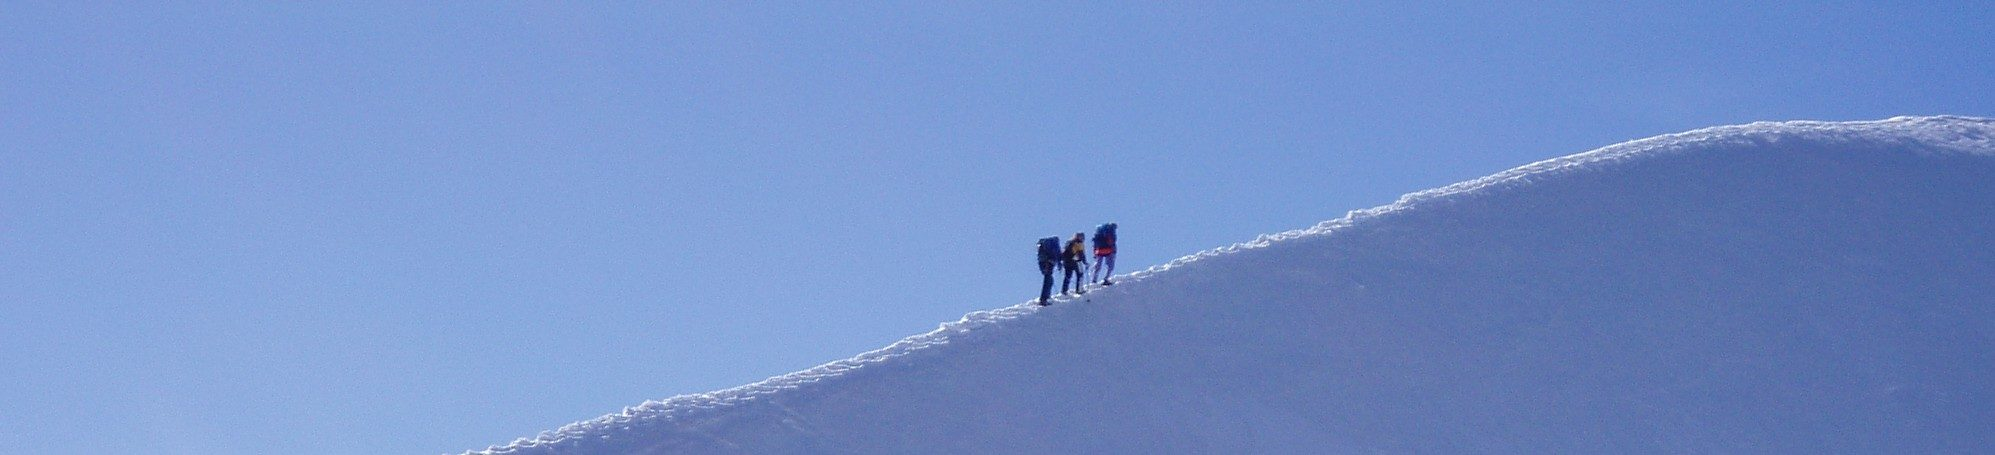 De Nederlandse bergsportcanon